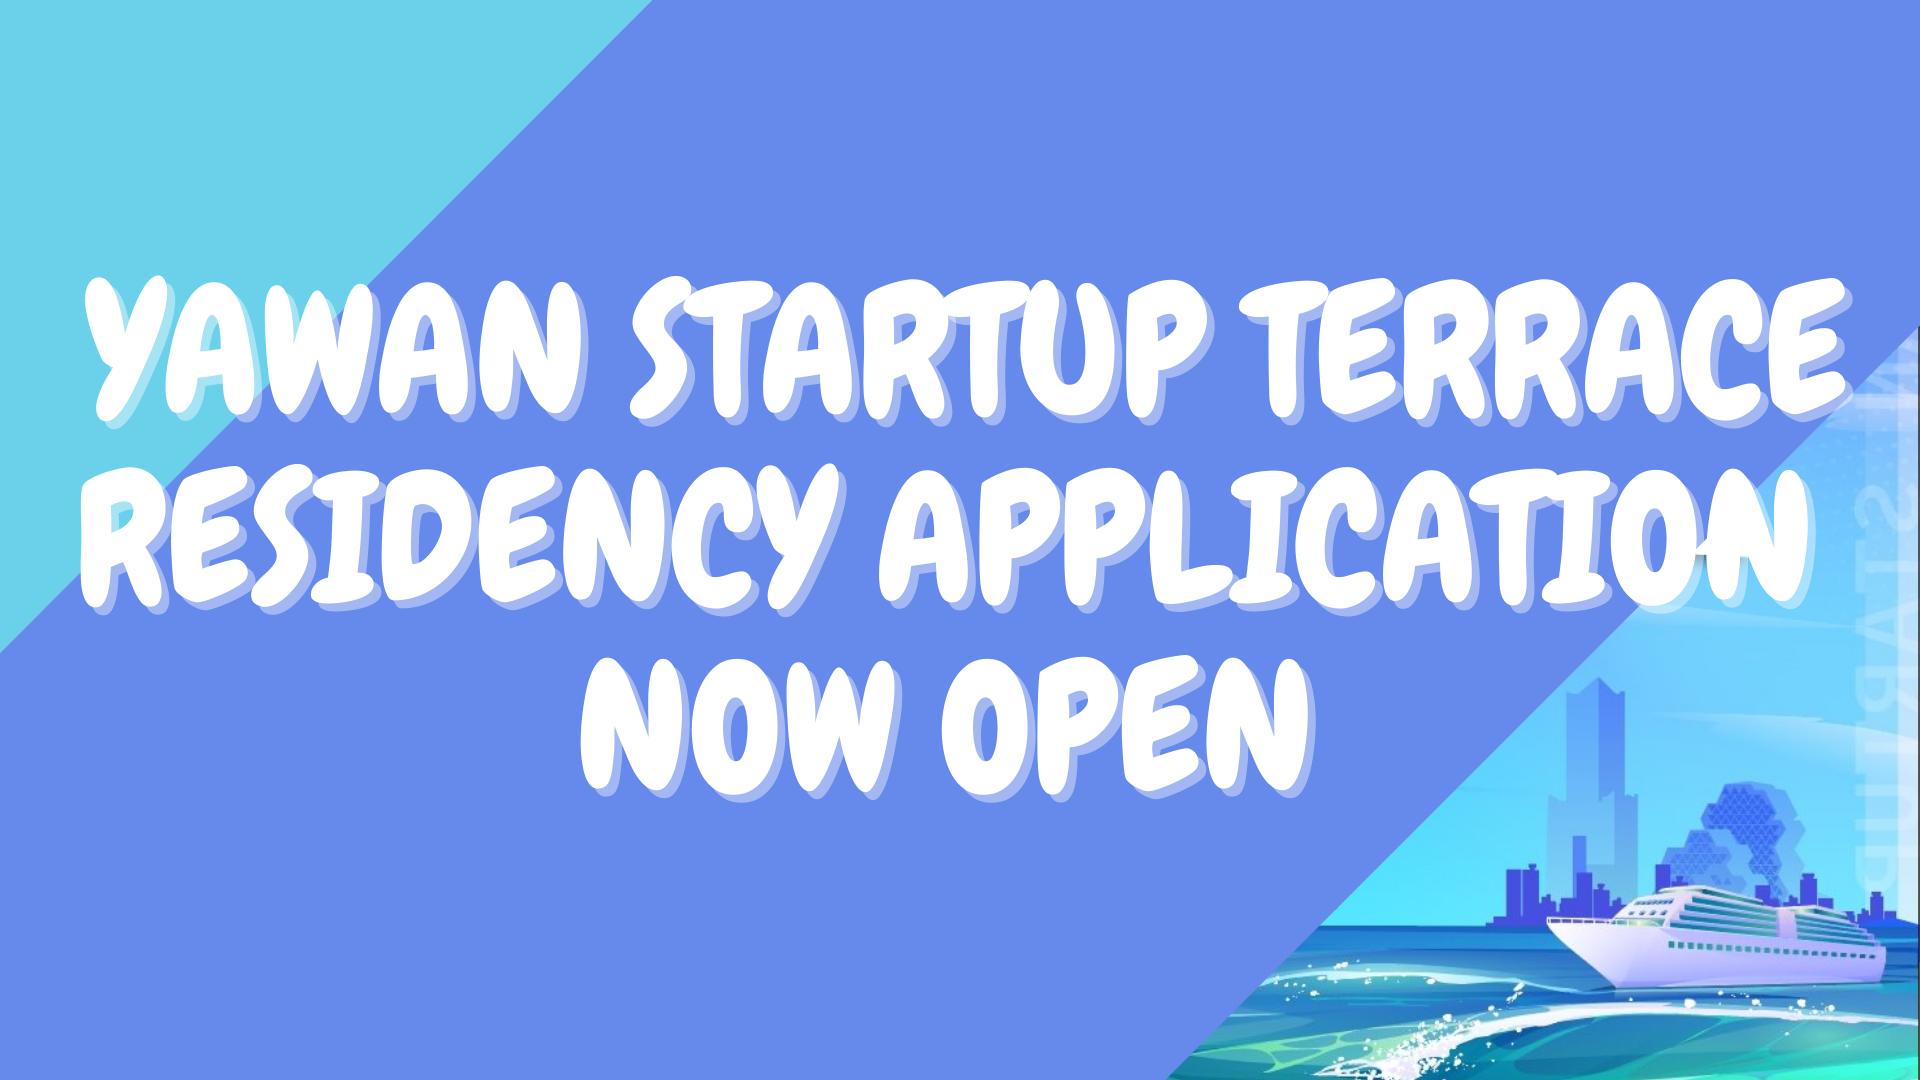 Application for Residency in Yawan Startup Terrace, 2021